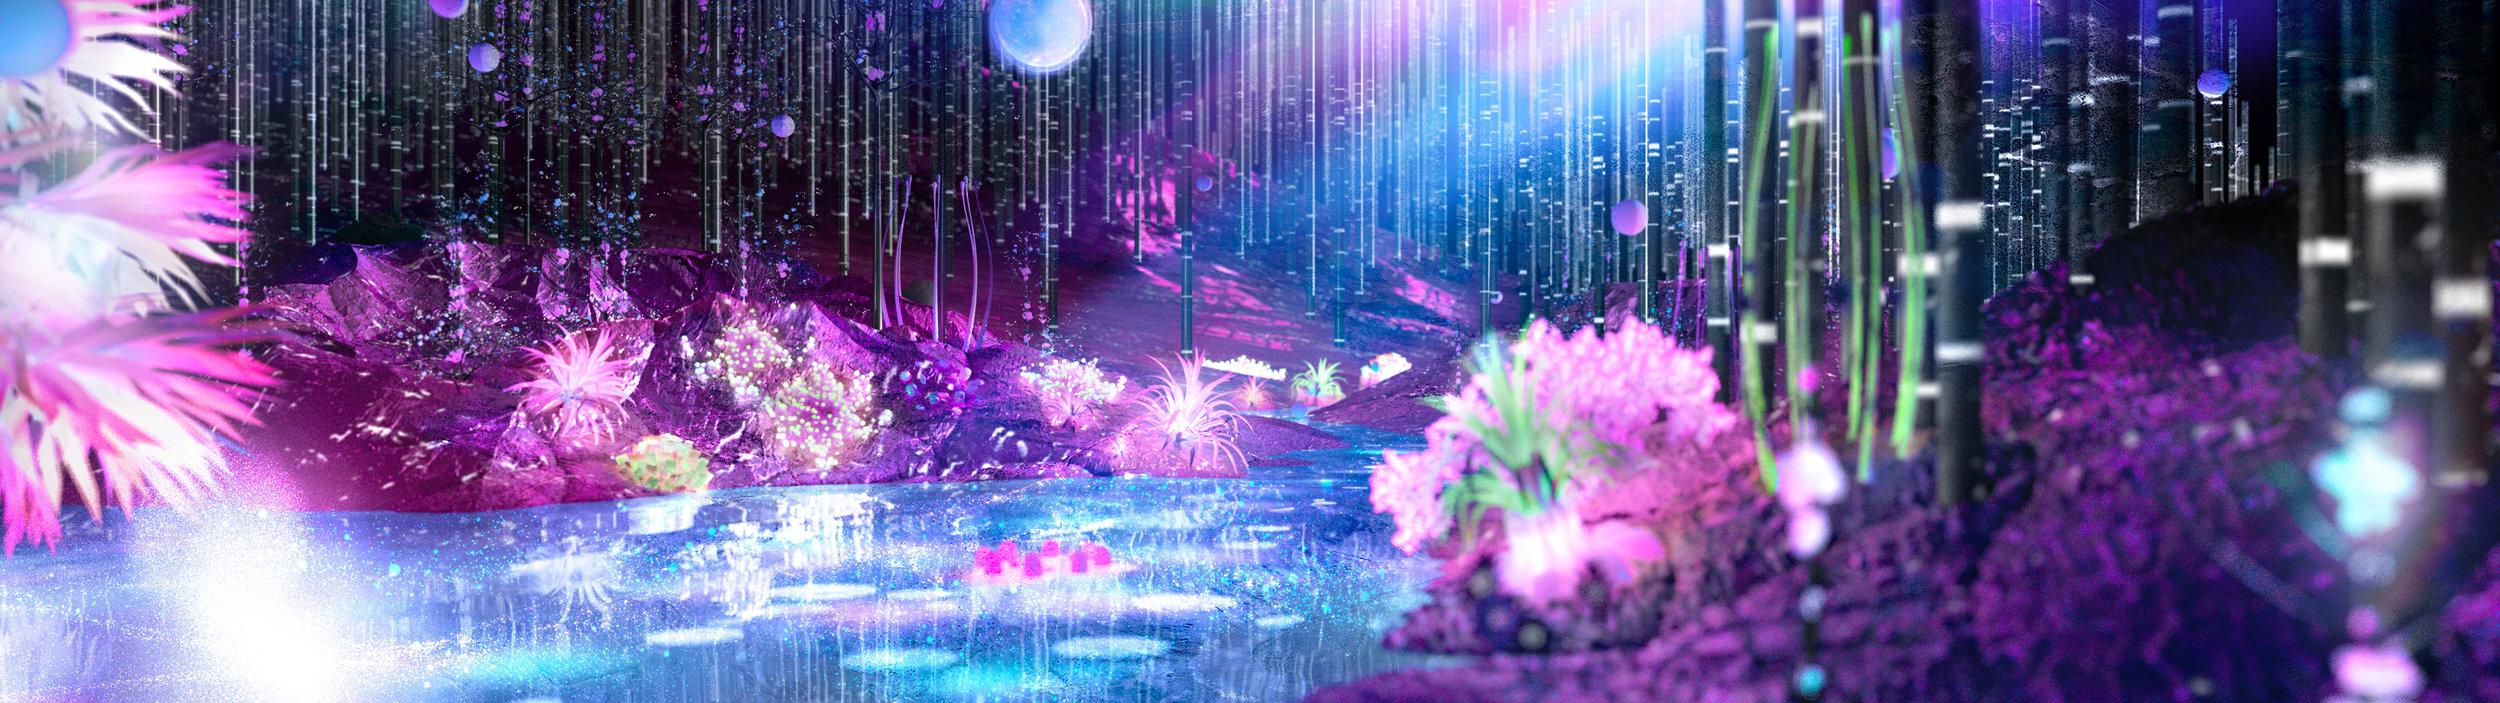 Luminescent_Forest_Design01.jpg